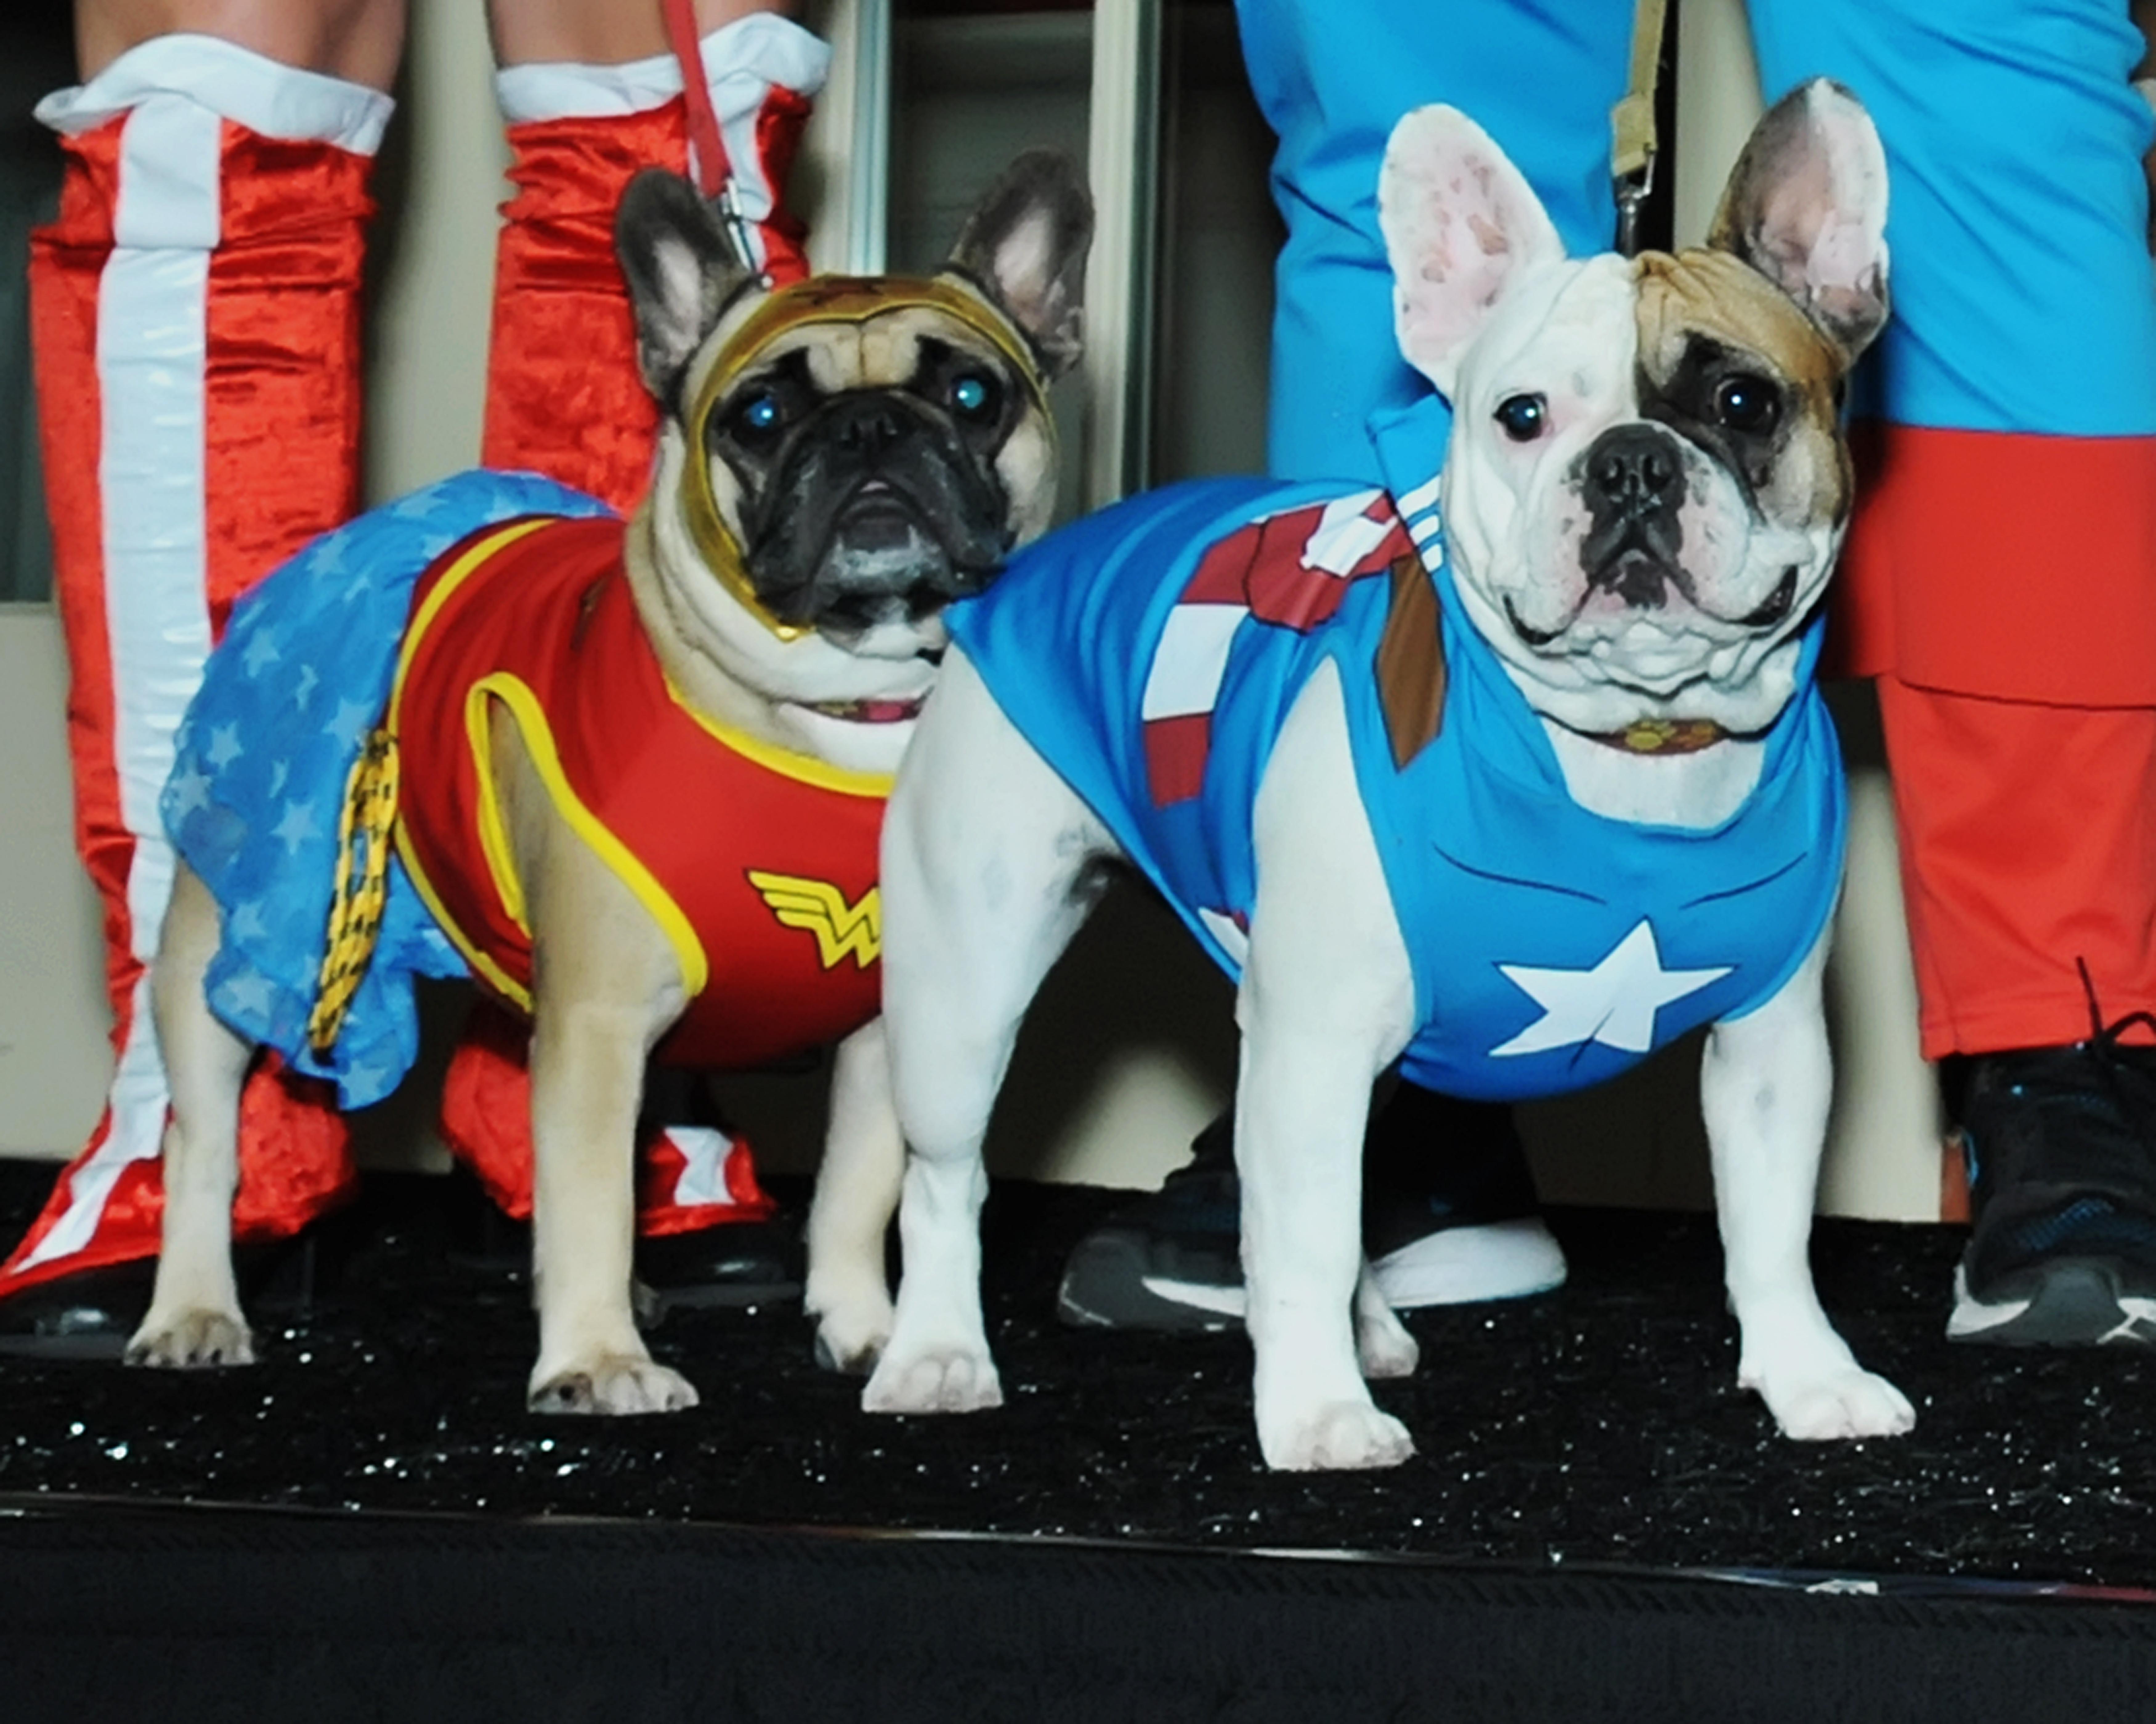 Dogs get in costume, Halloween spirit to benefit welfare league (Photos)